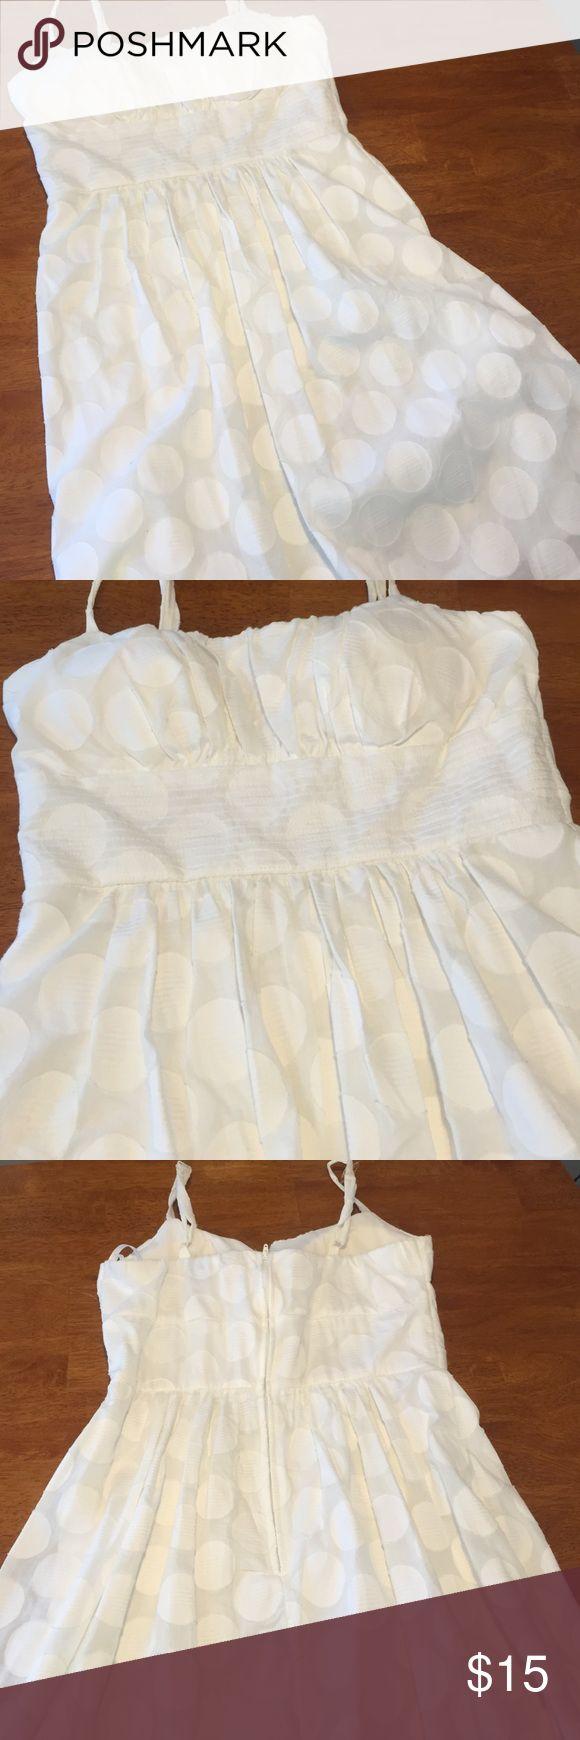 White polka dot dress Double layered white polka dot dress. Thick waistband. Padding in the boobs. Adjustable straps. Great graduation dress. No trades sorry. B. Smart Dresses Mini